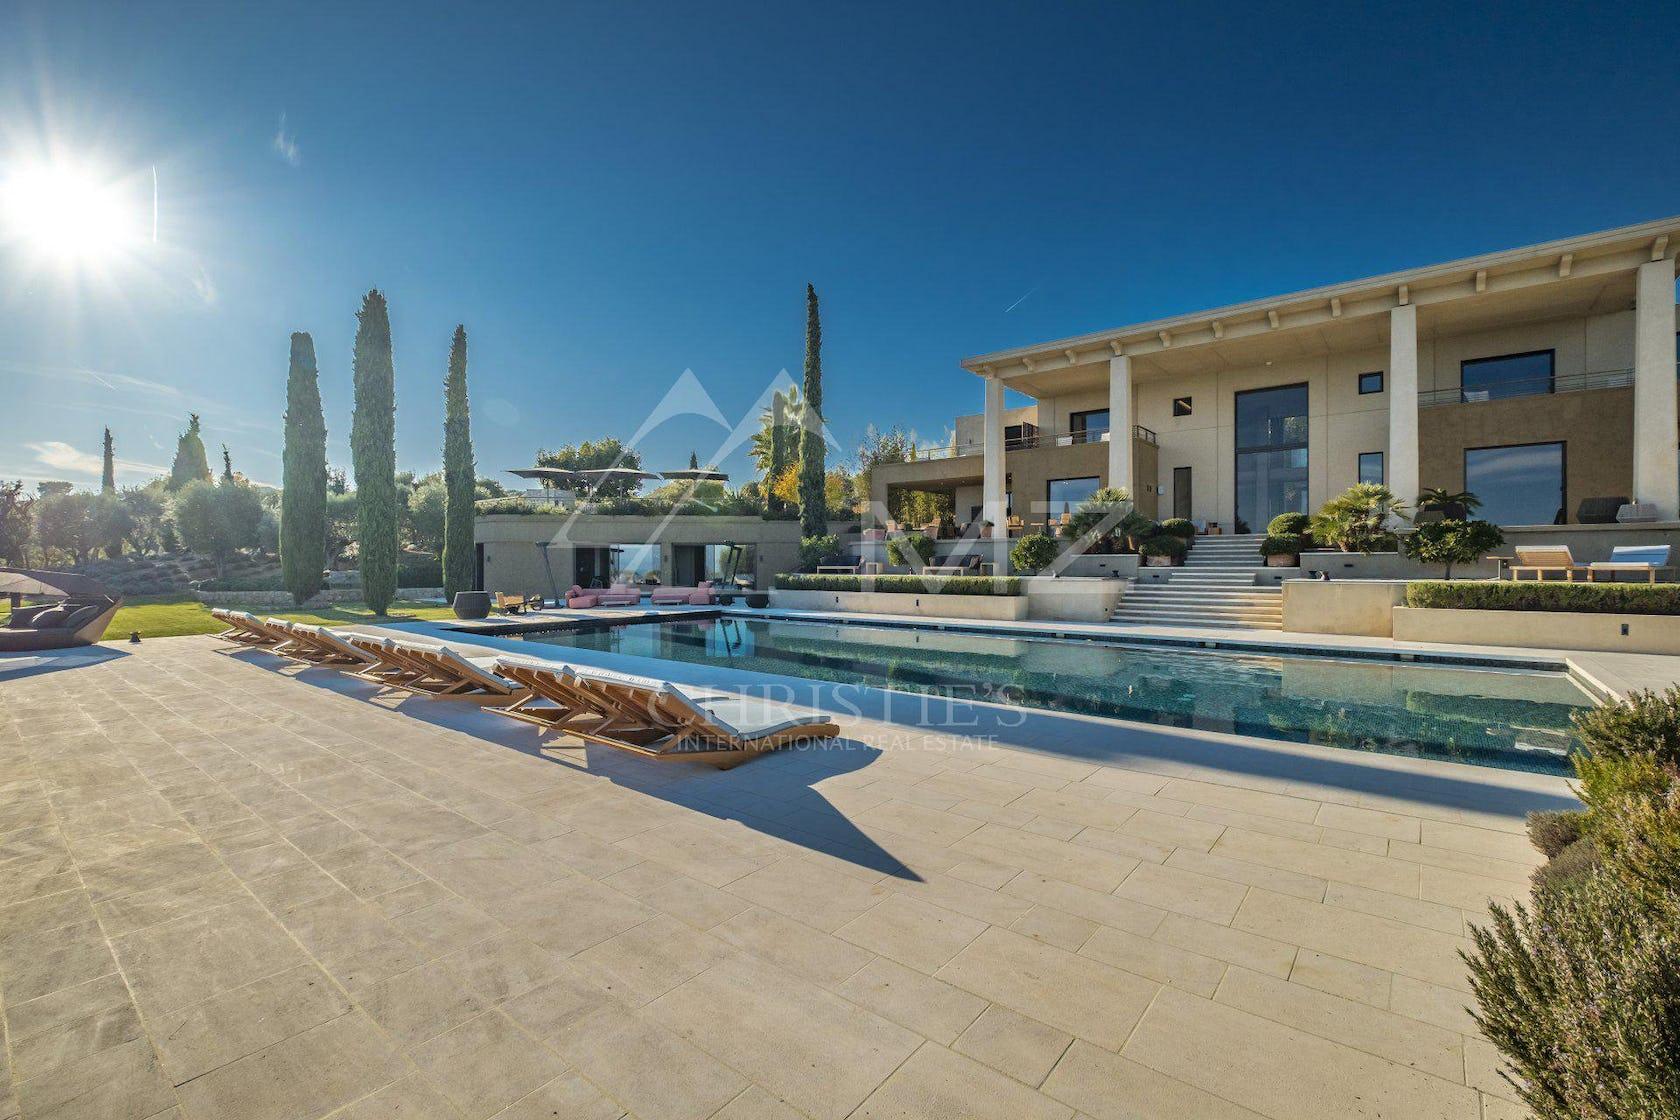 building pool water hotel metropolis urban city resort villa housing